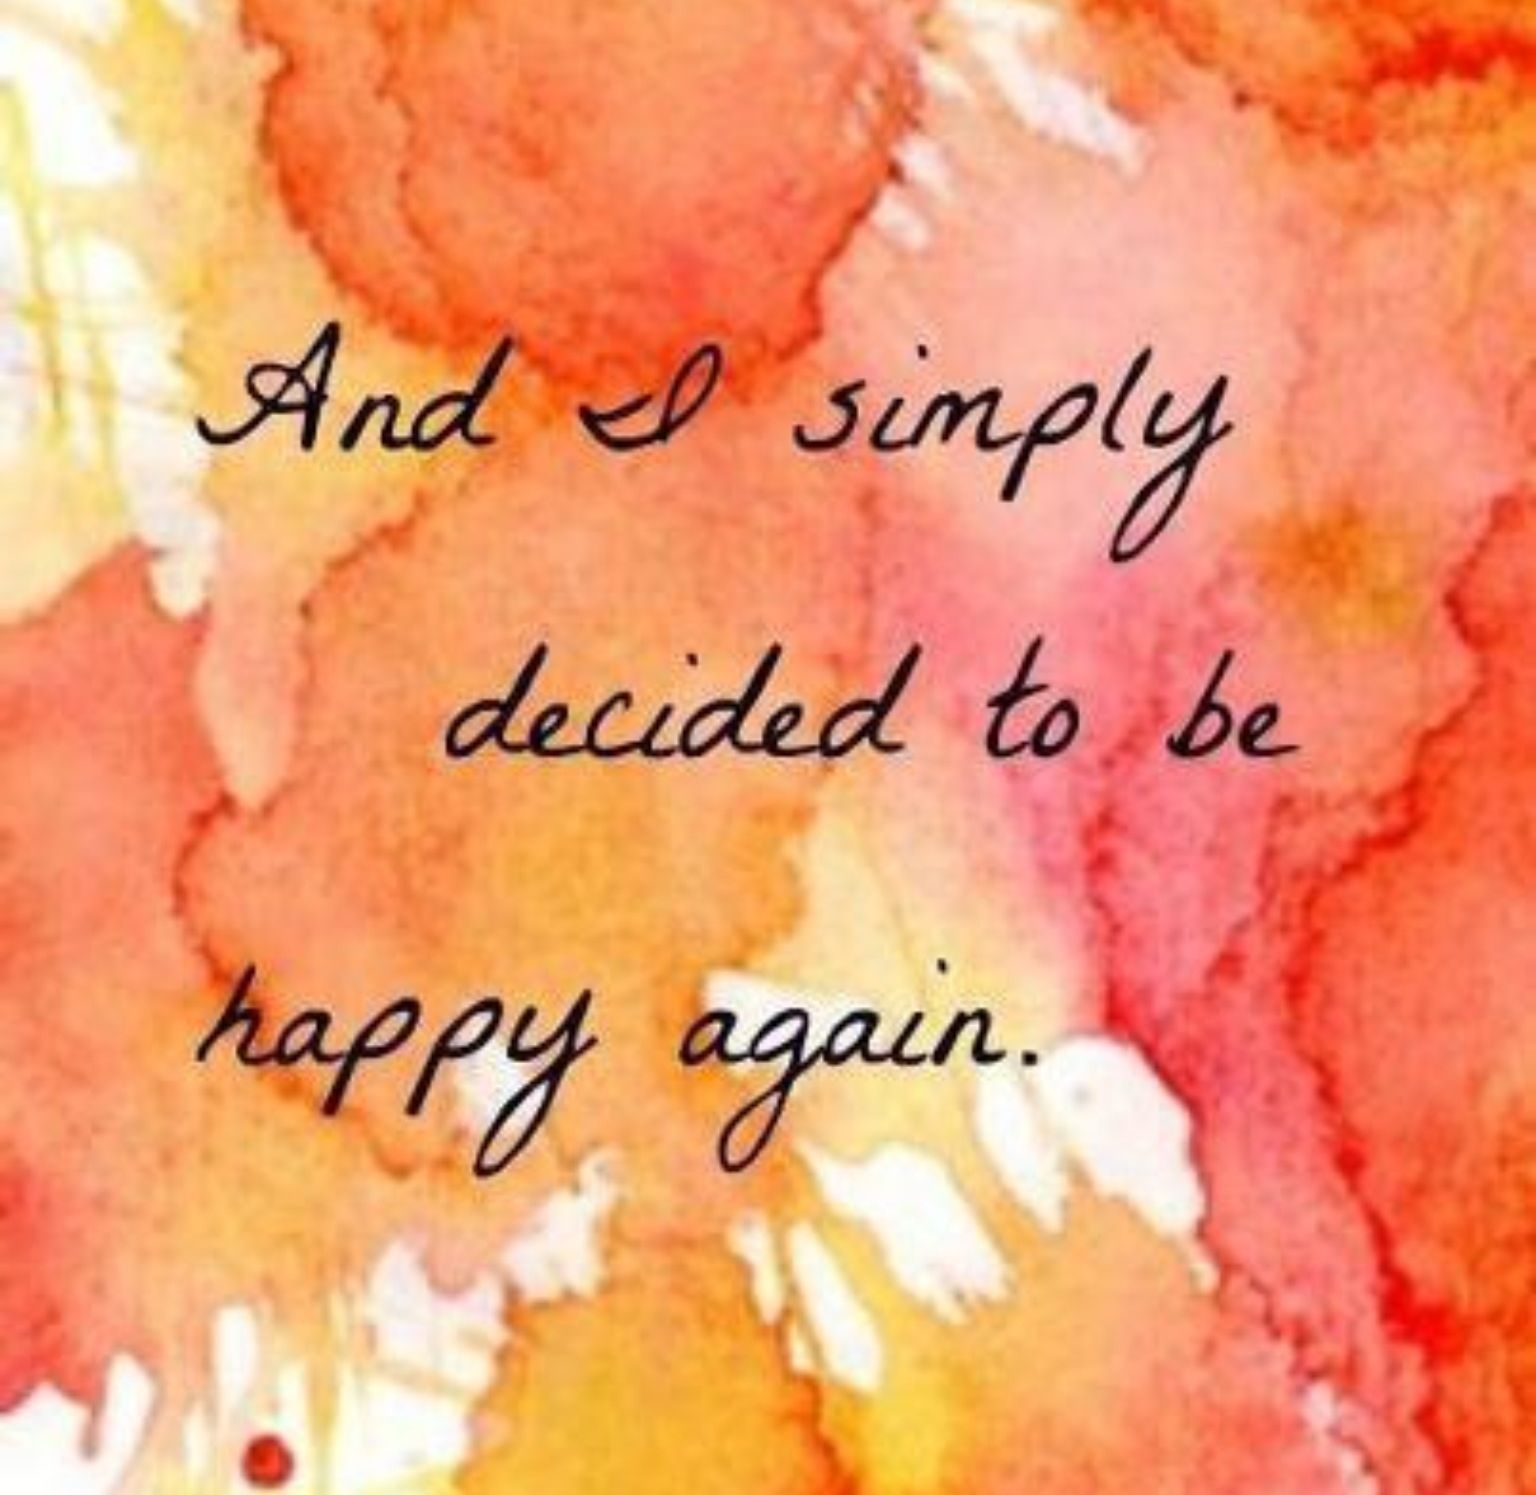 Afbeeldingsresultaat voor and i simply choose to be happy again